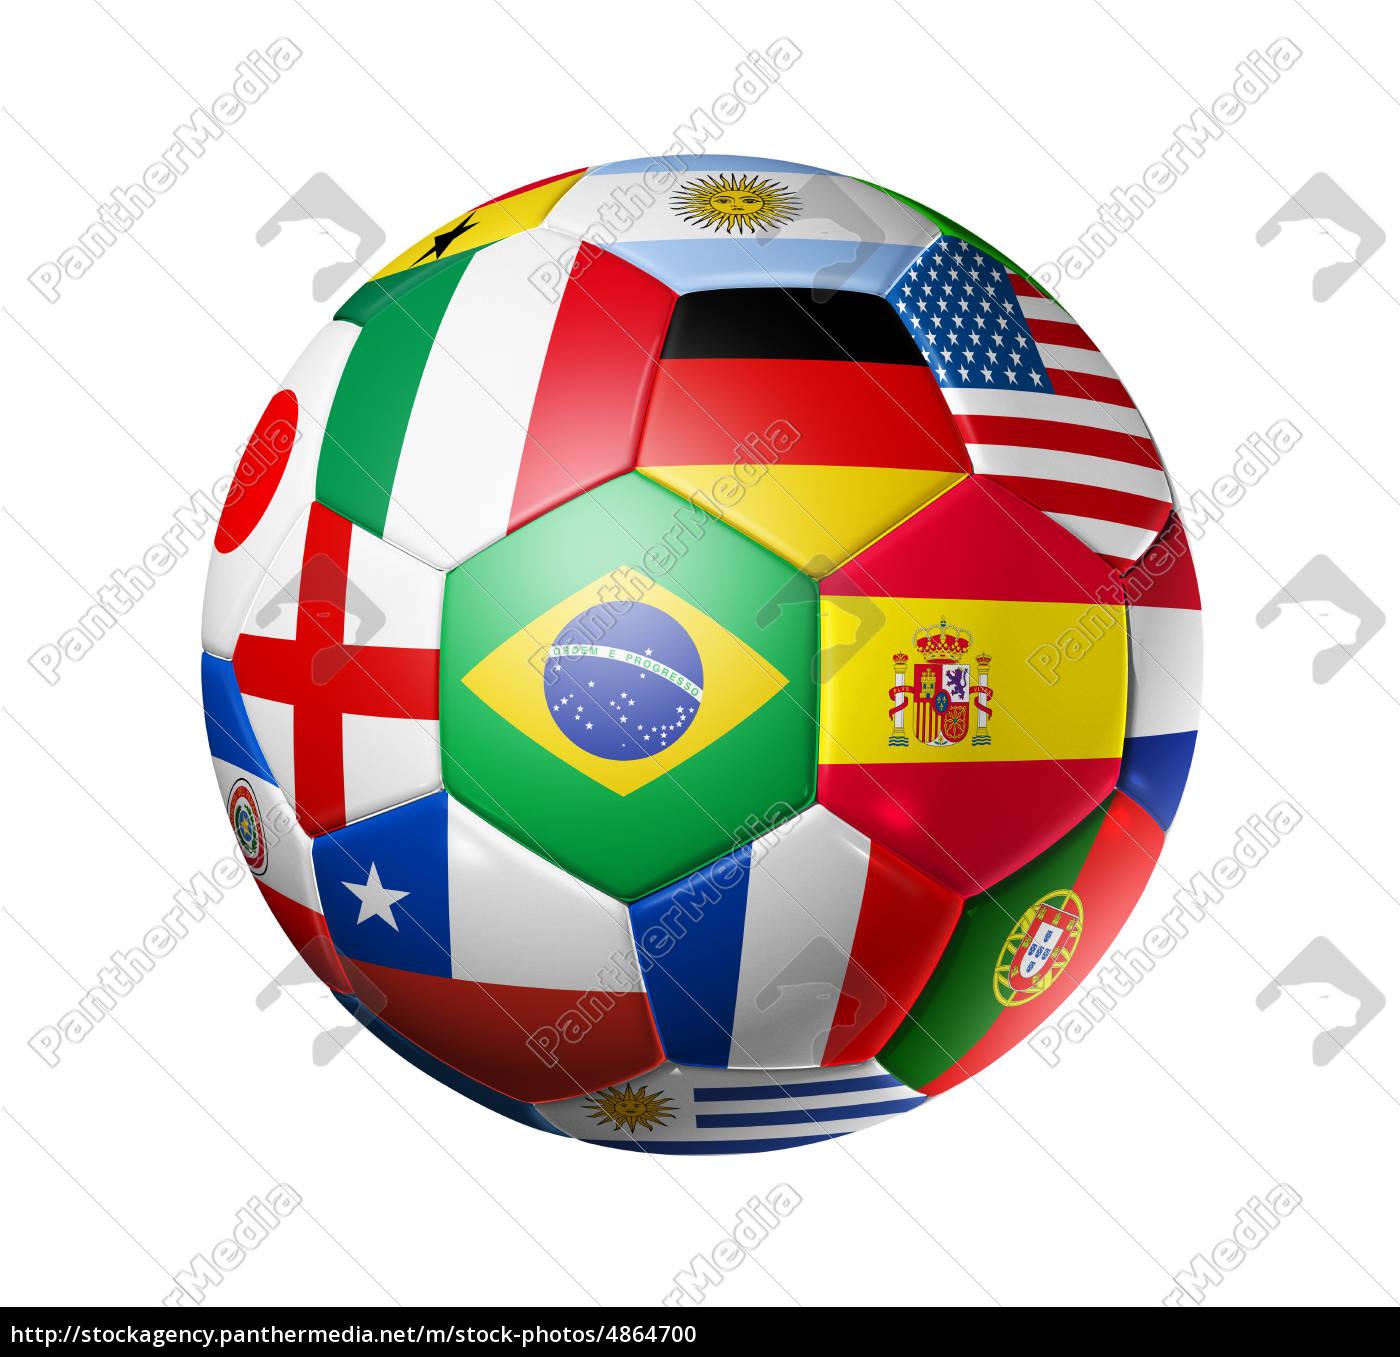 football, soccer, ball, with, world, teams - 4864700